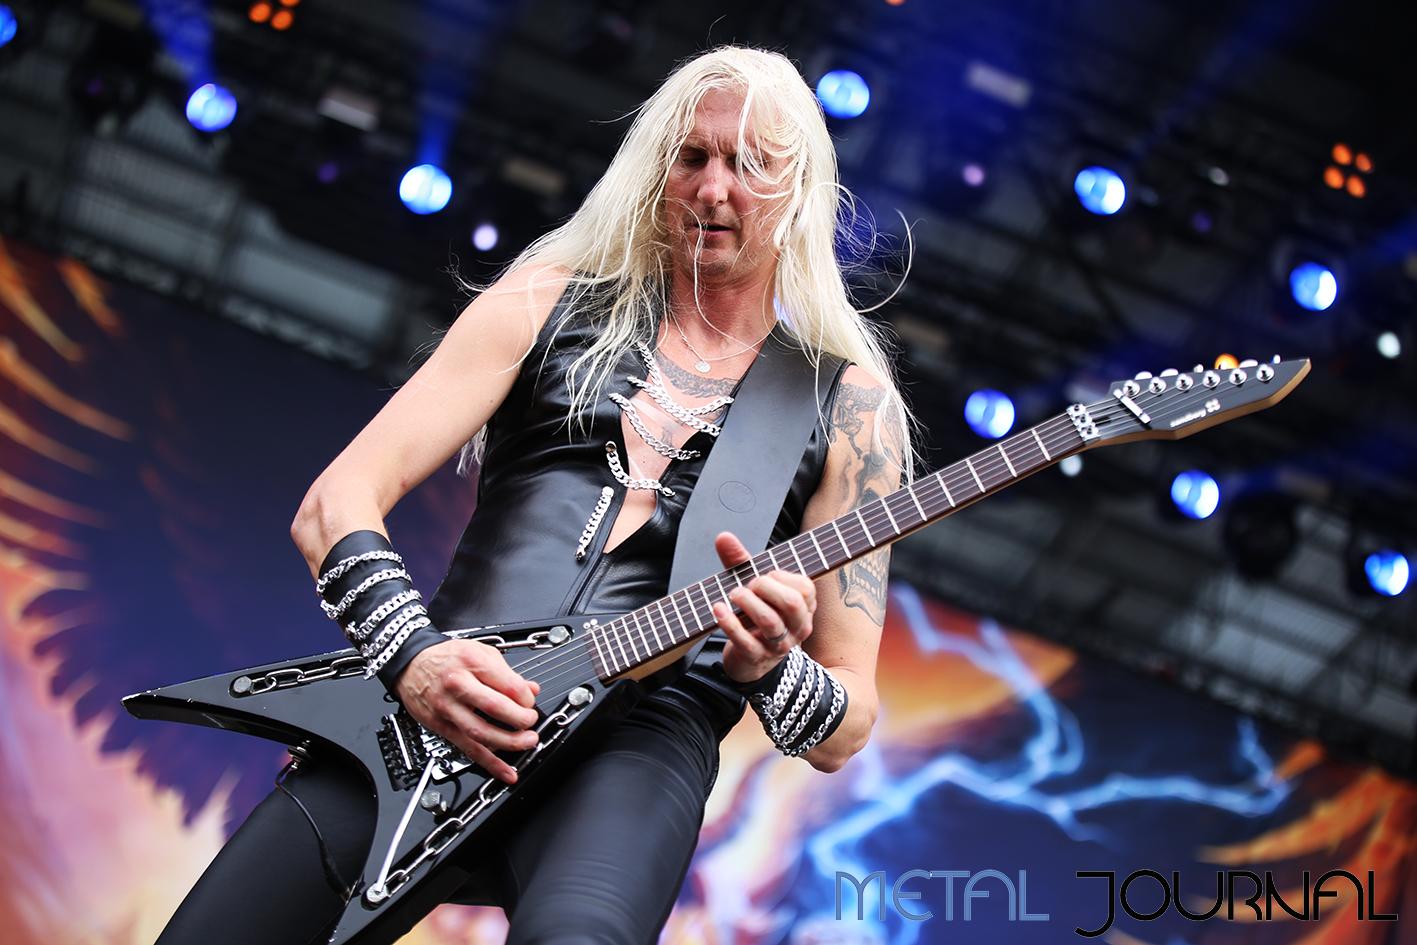 hammerfall - metal journal rock fest barcelona 2019 pic 9